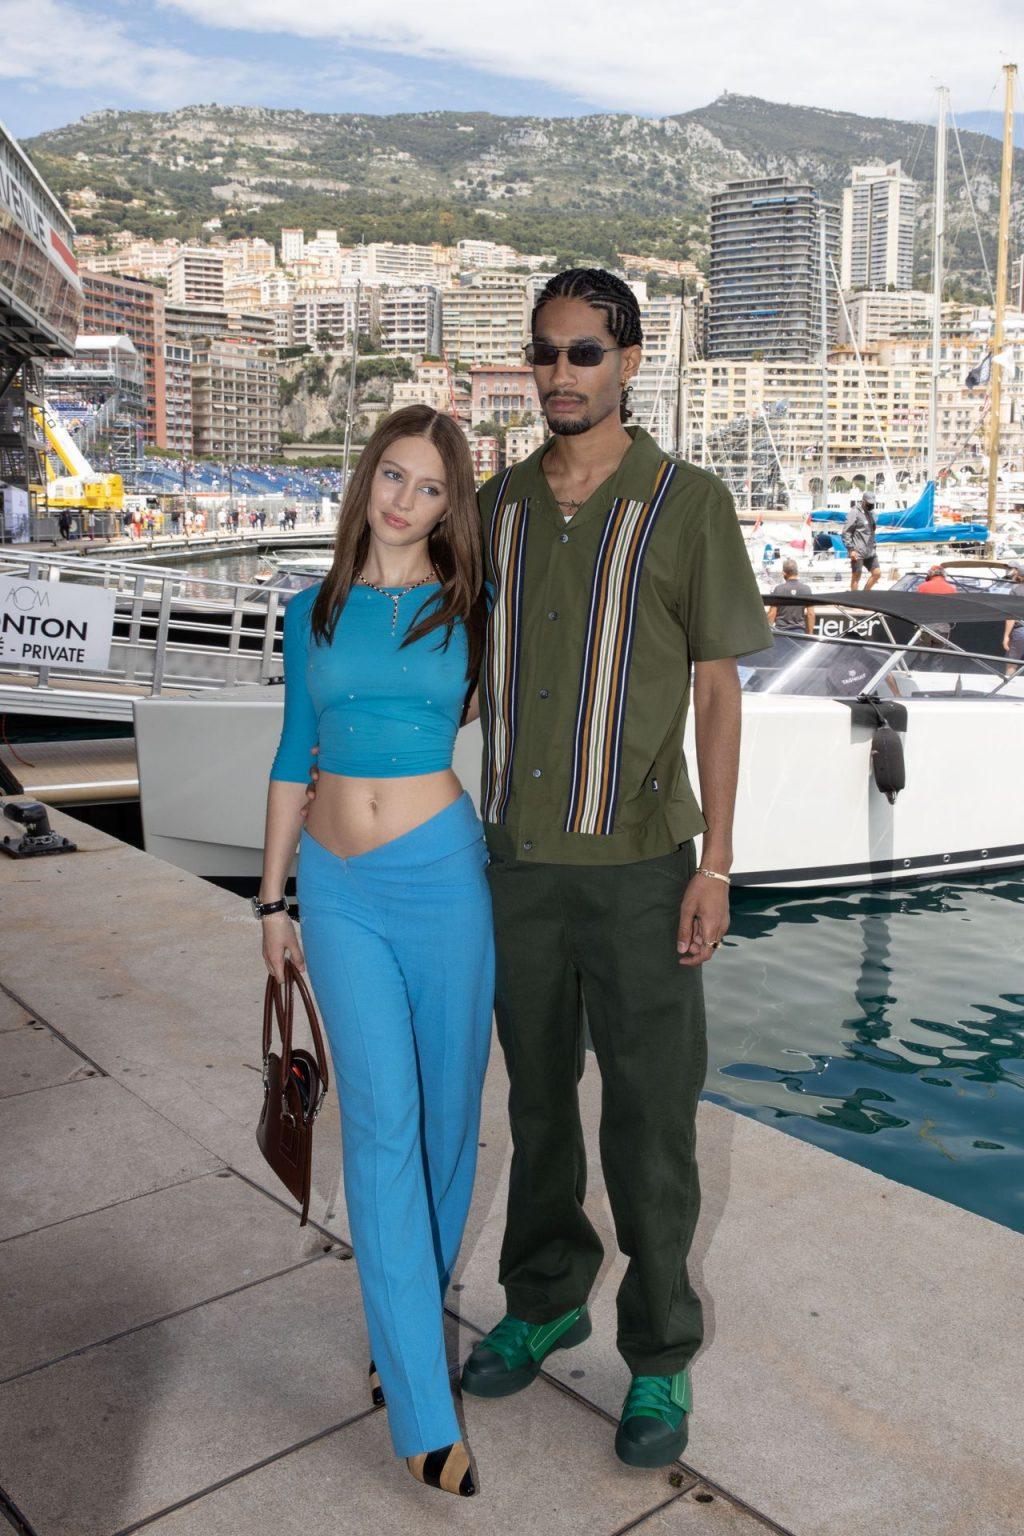 Iris Law & Jyrrel Roberts Attend The 68th Formula 1 Grand Prix of Monaco (18 Photos)